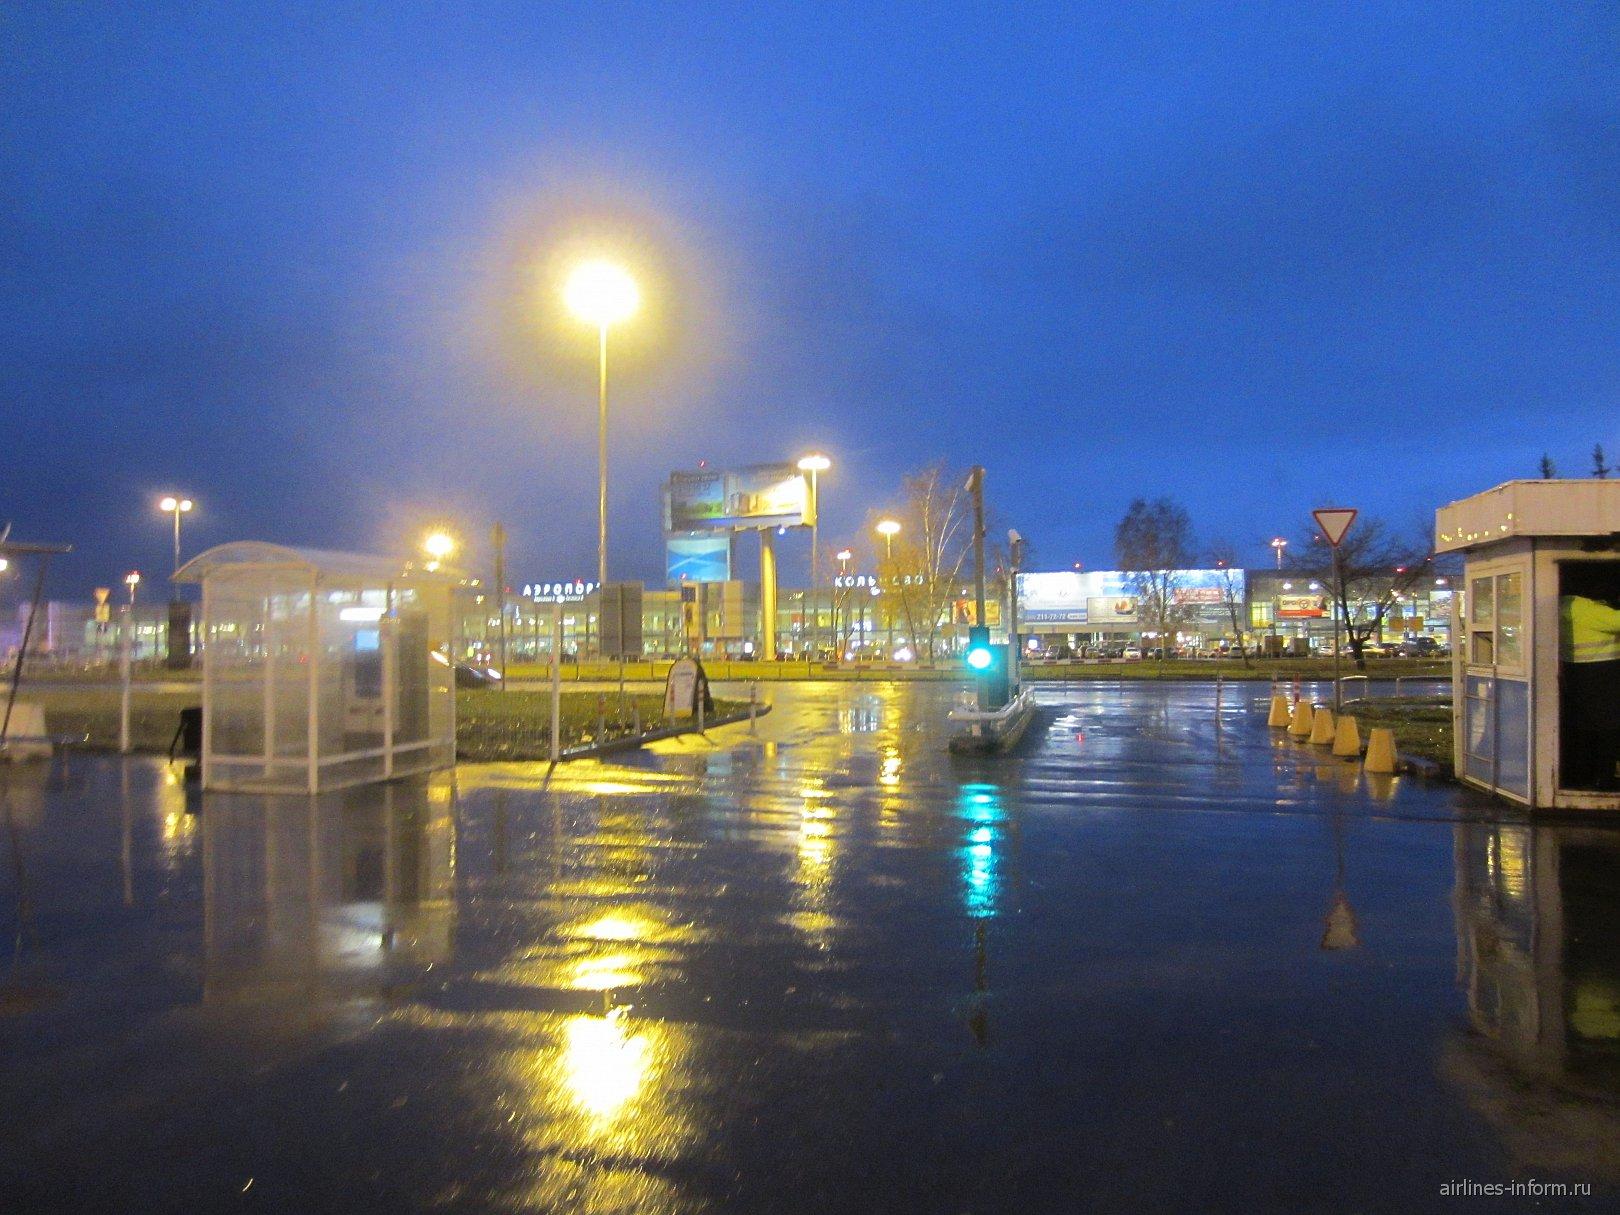 Аэропорт Екатеринбург Кольцово